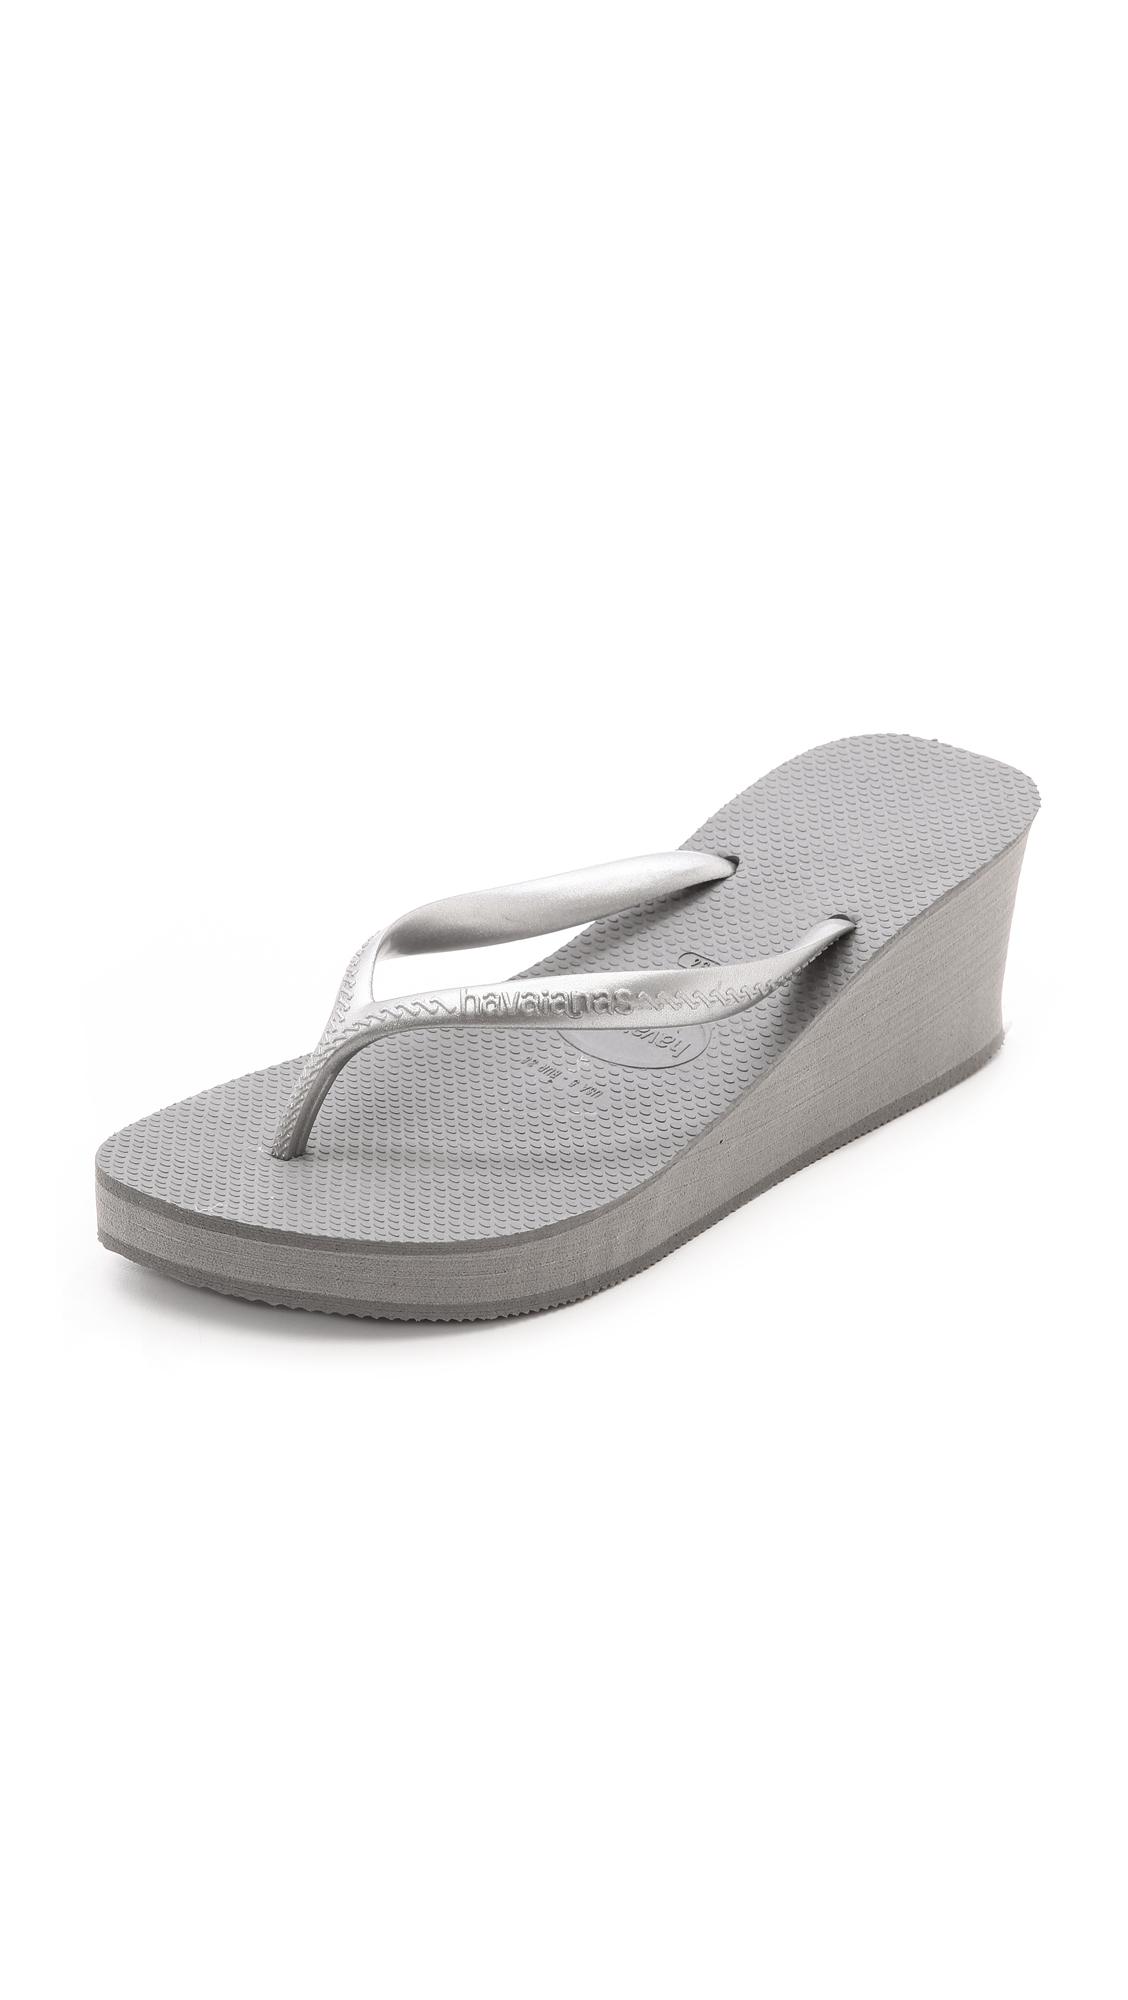 cc0eabdc5571 Havaianas High Fashion Wedge Flip Flops